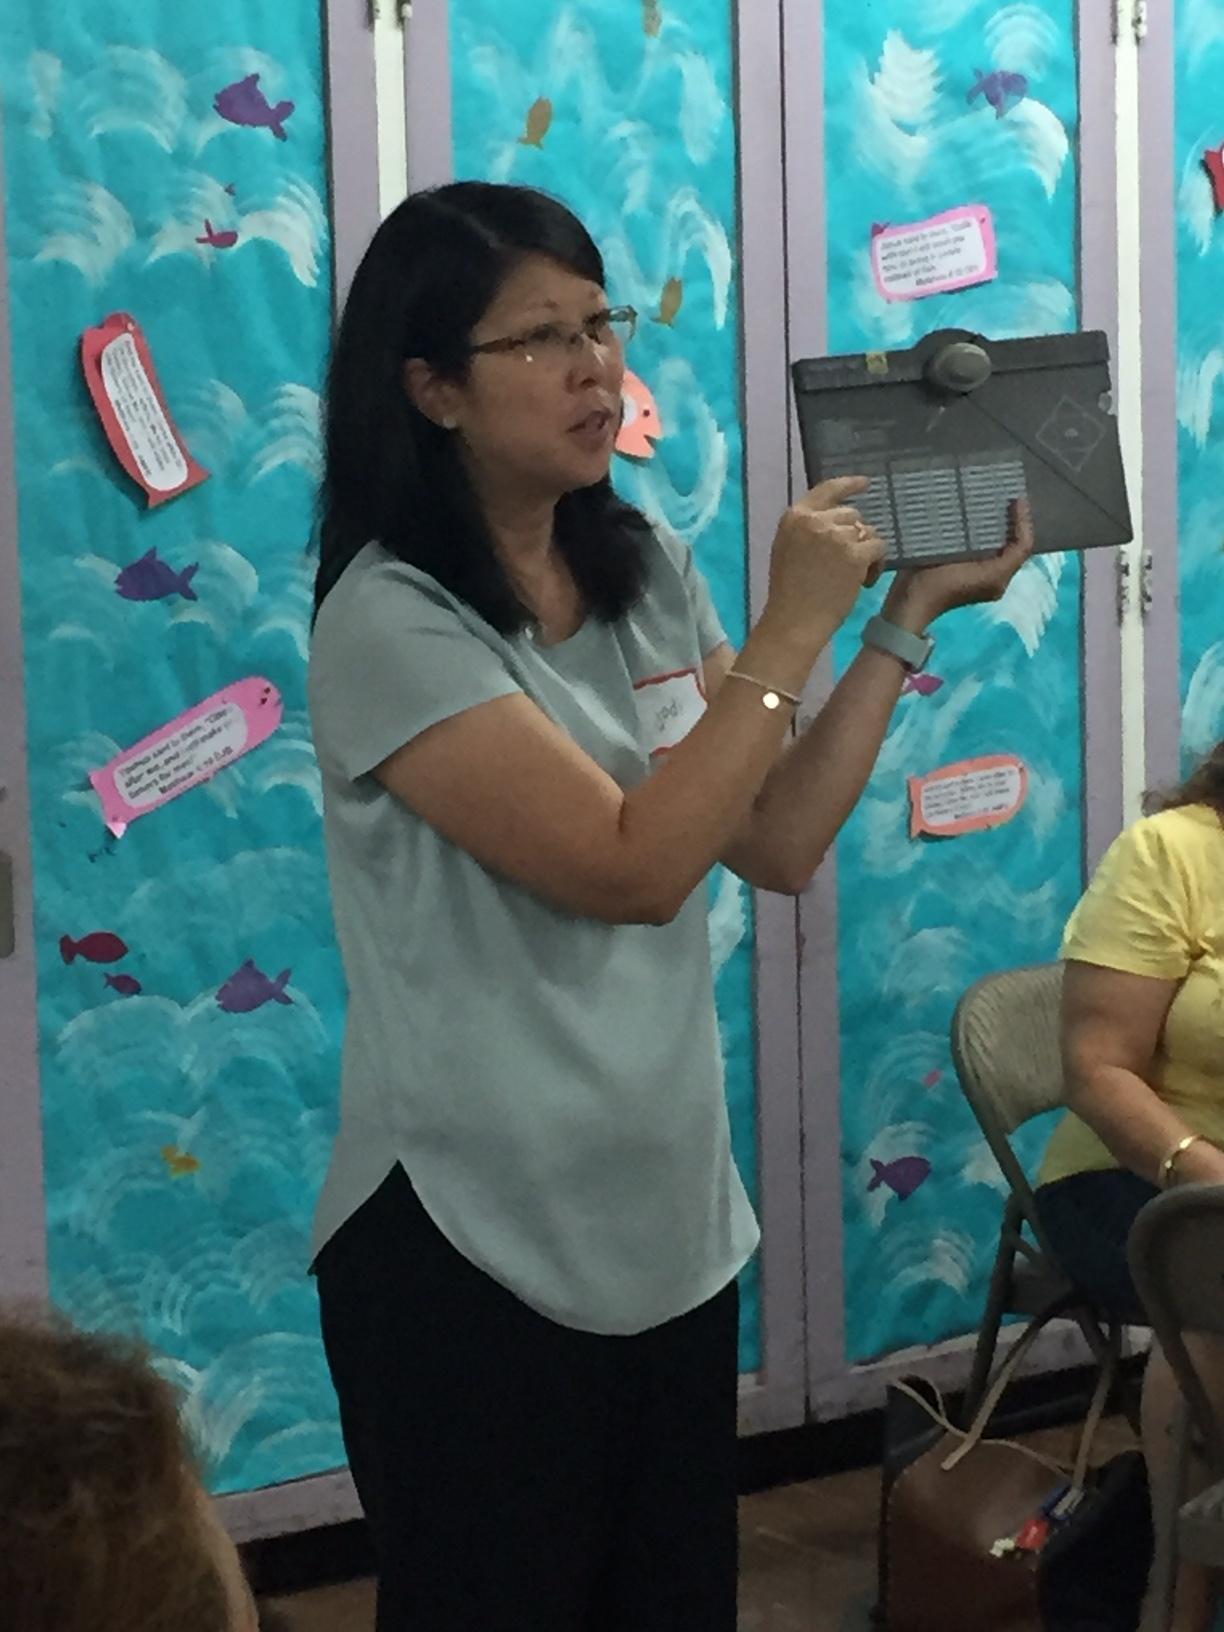 Jodi shares at Inspiration Night - www.stampedwithaloha.com